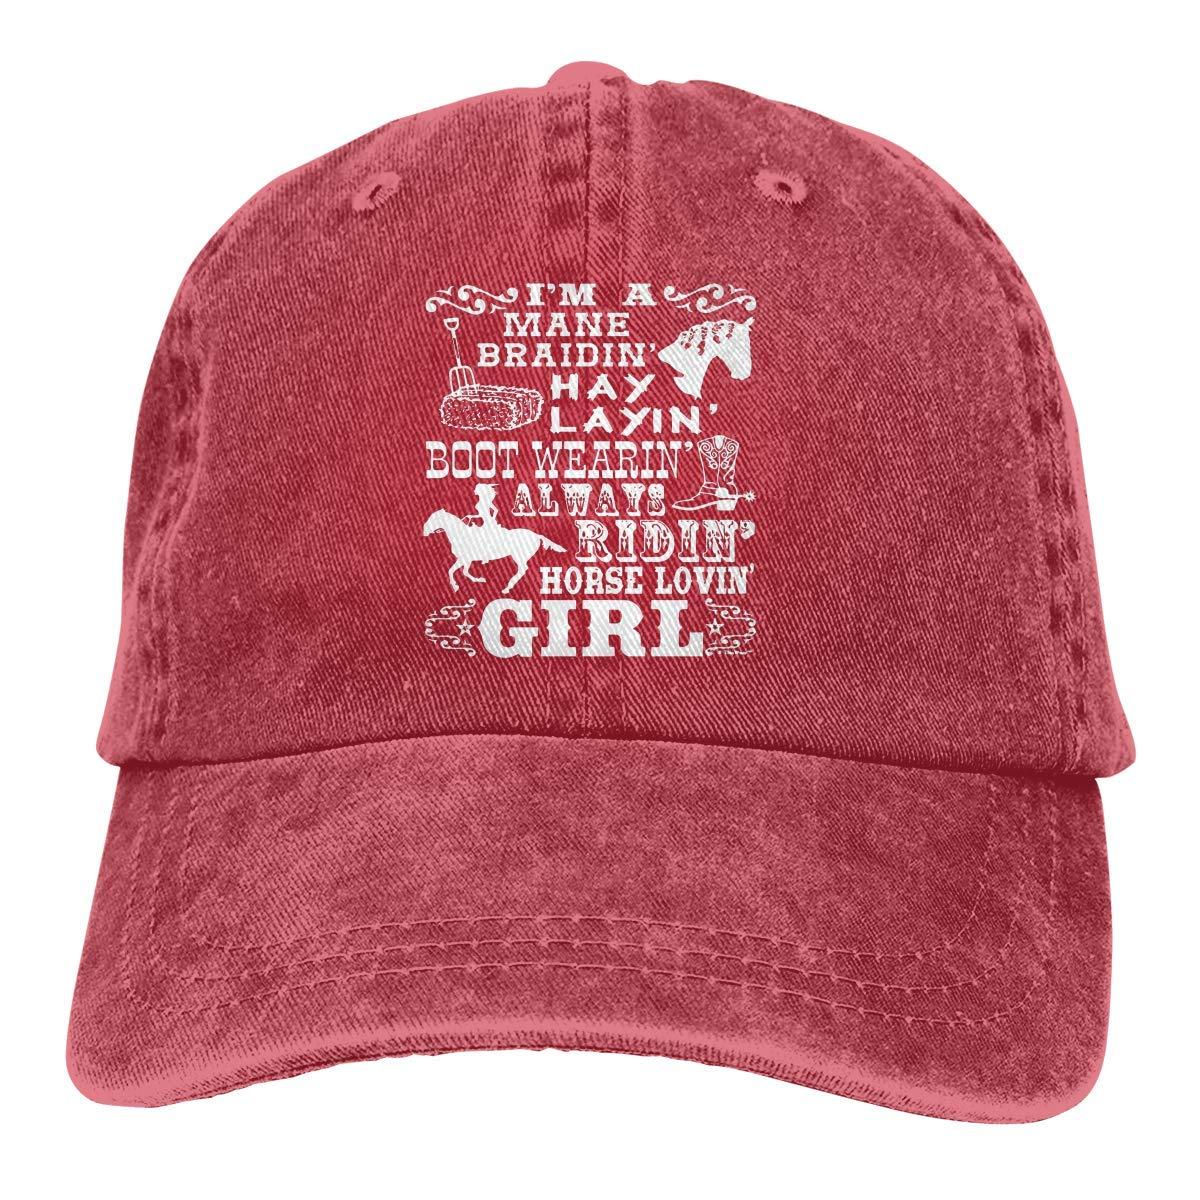 Unisex Adults Vintage Washed Baseball Cap Adjustable Dad Hat - Horse Loving Girl Gift Horseback Riding Poem Black